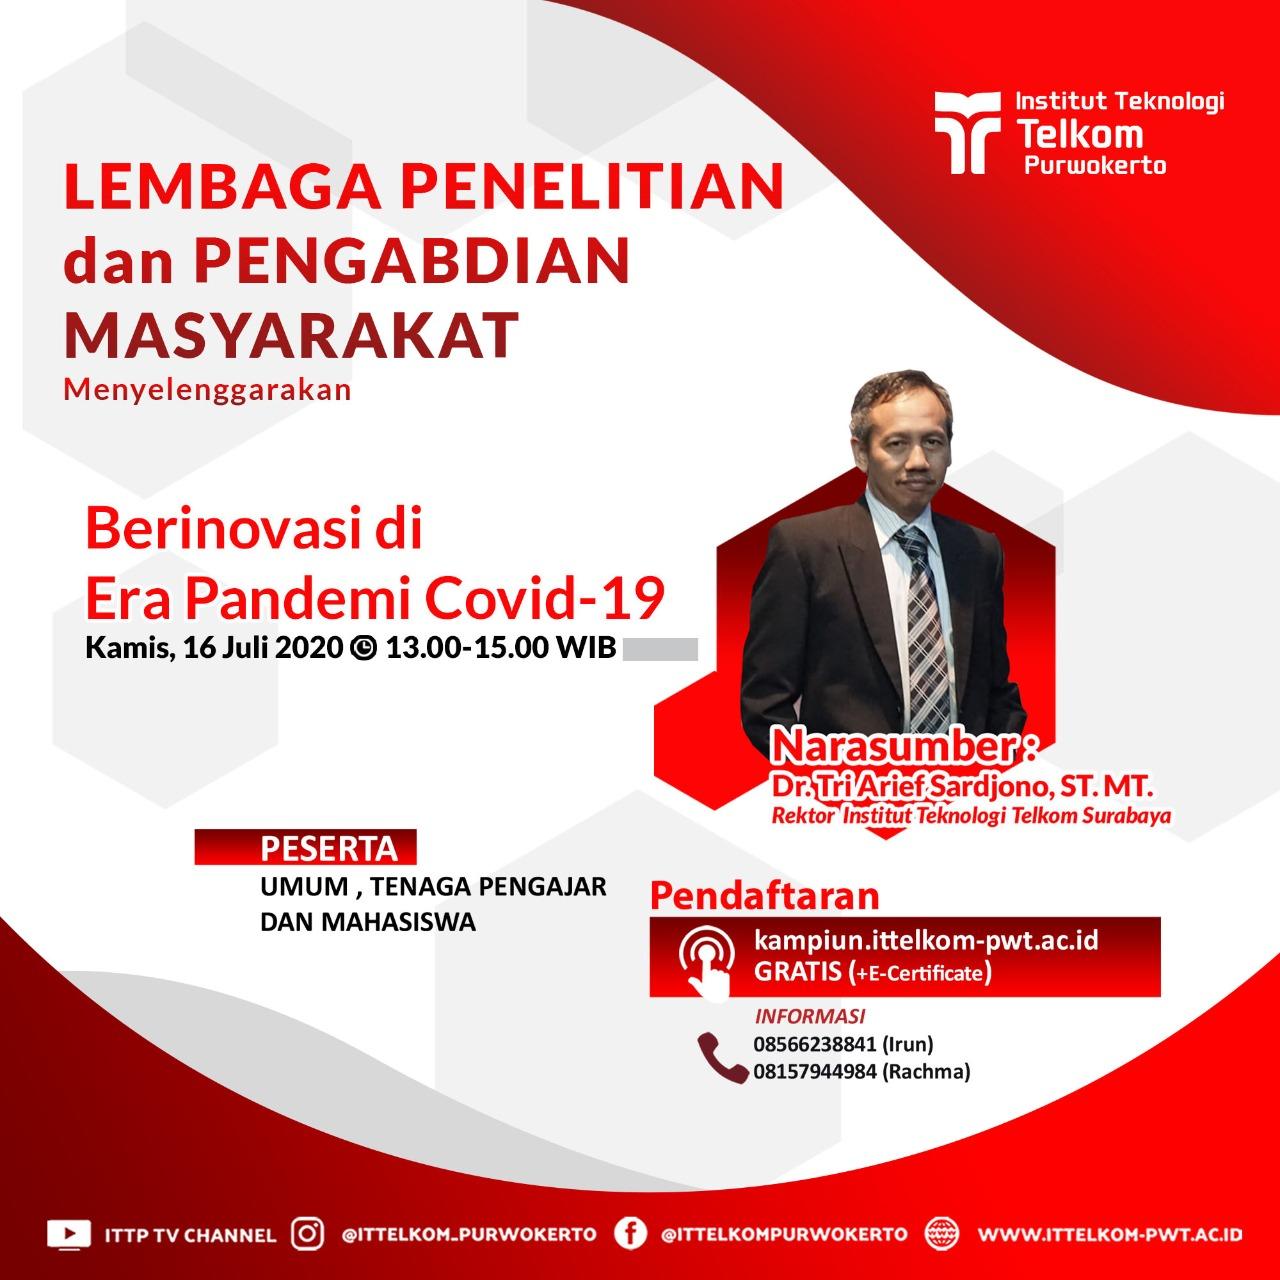 Berinovasi di Era Pandemi Covid-19